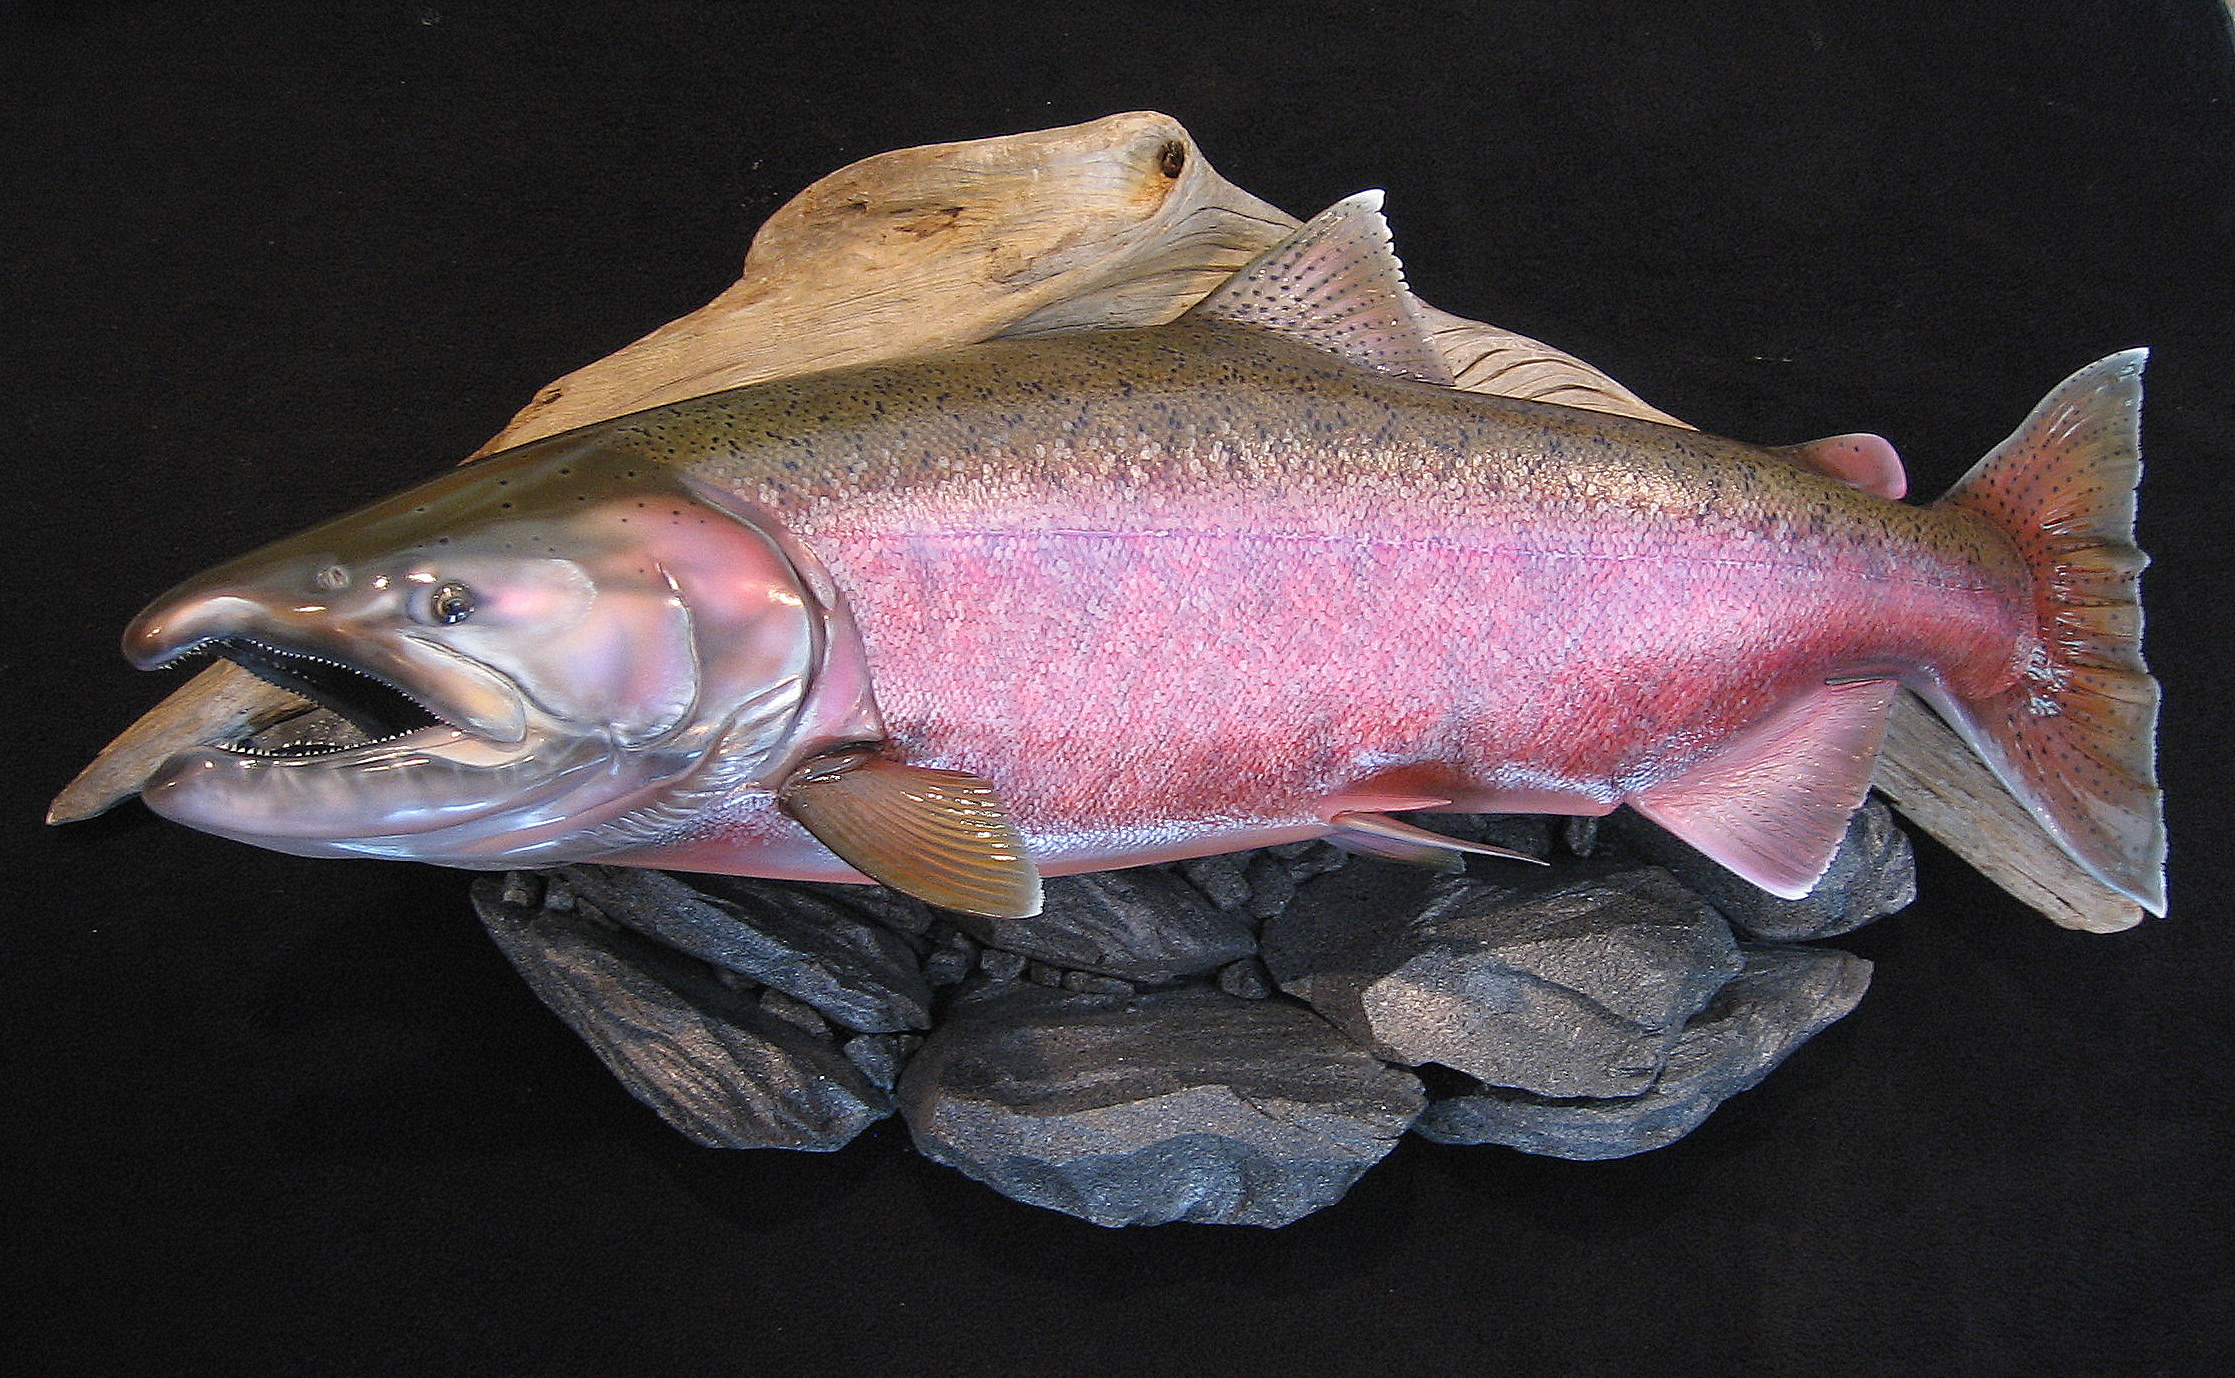 Alaskan spawning king salmon fish replica Luke Filmer Blackwater